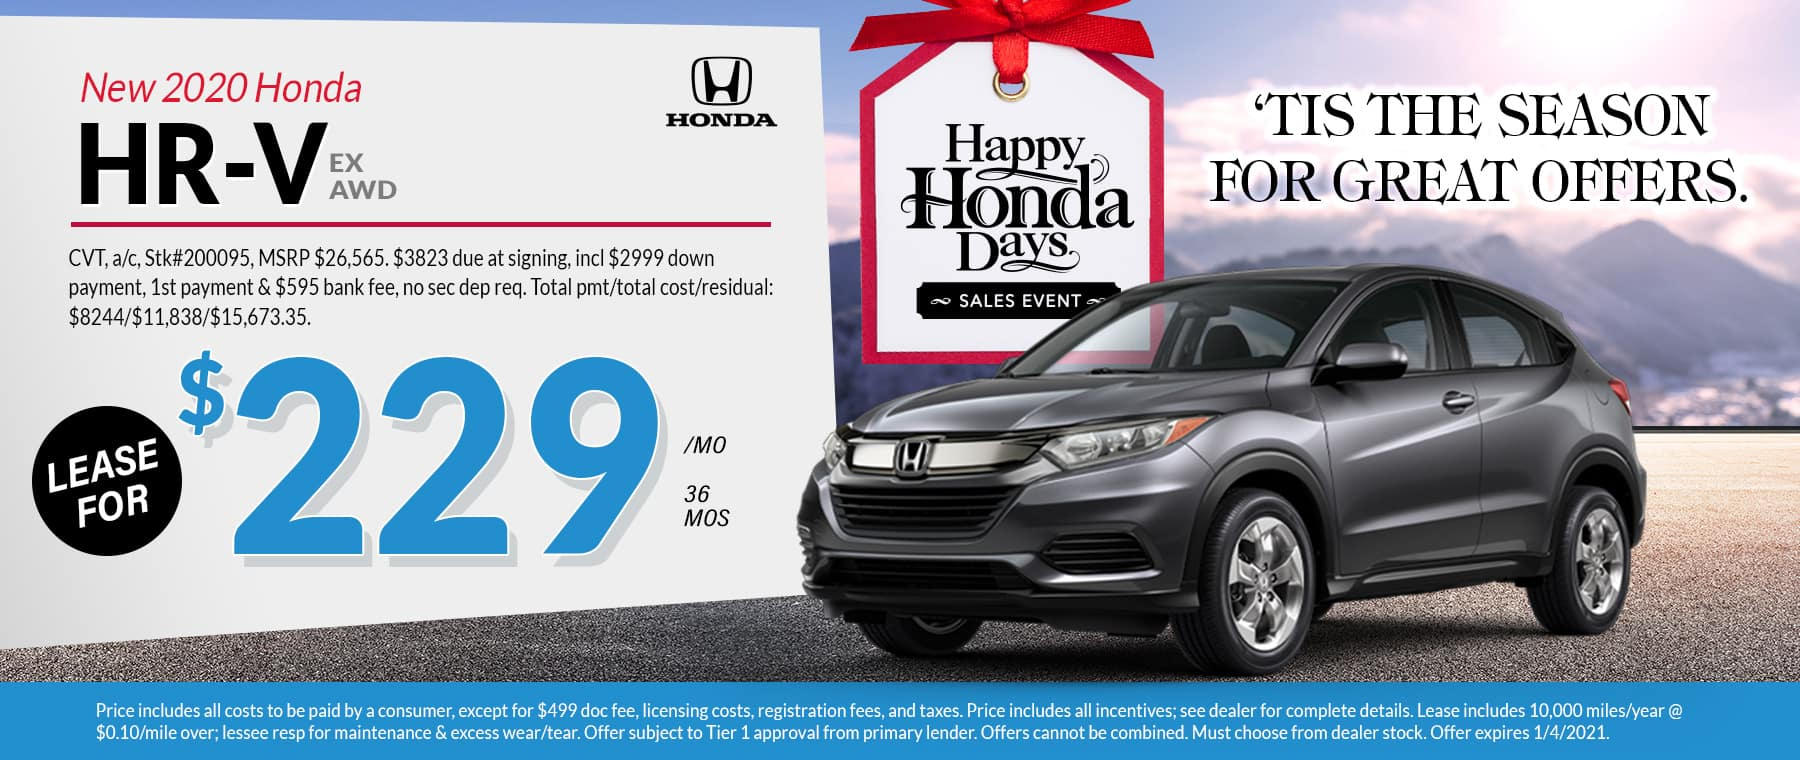 2020 Honda HR-V November 2020